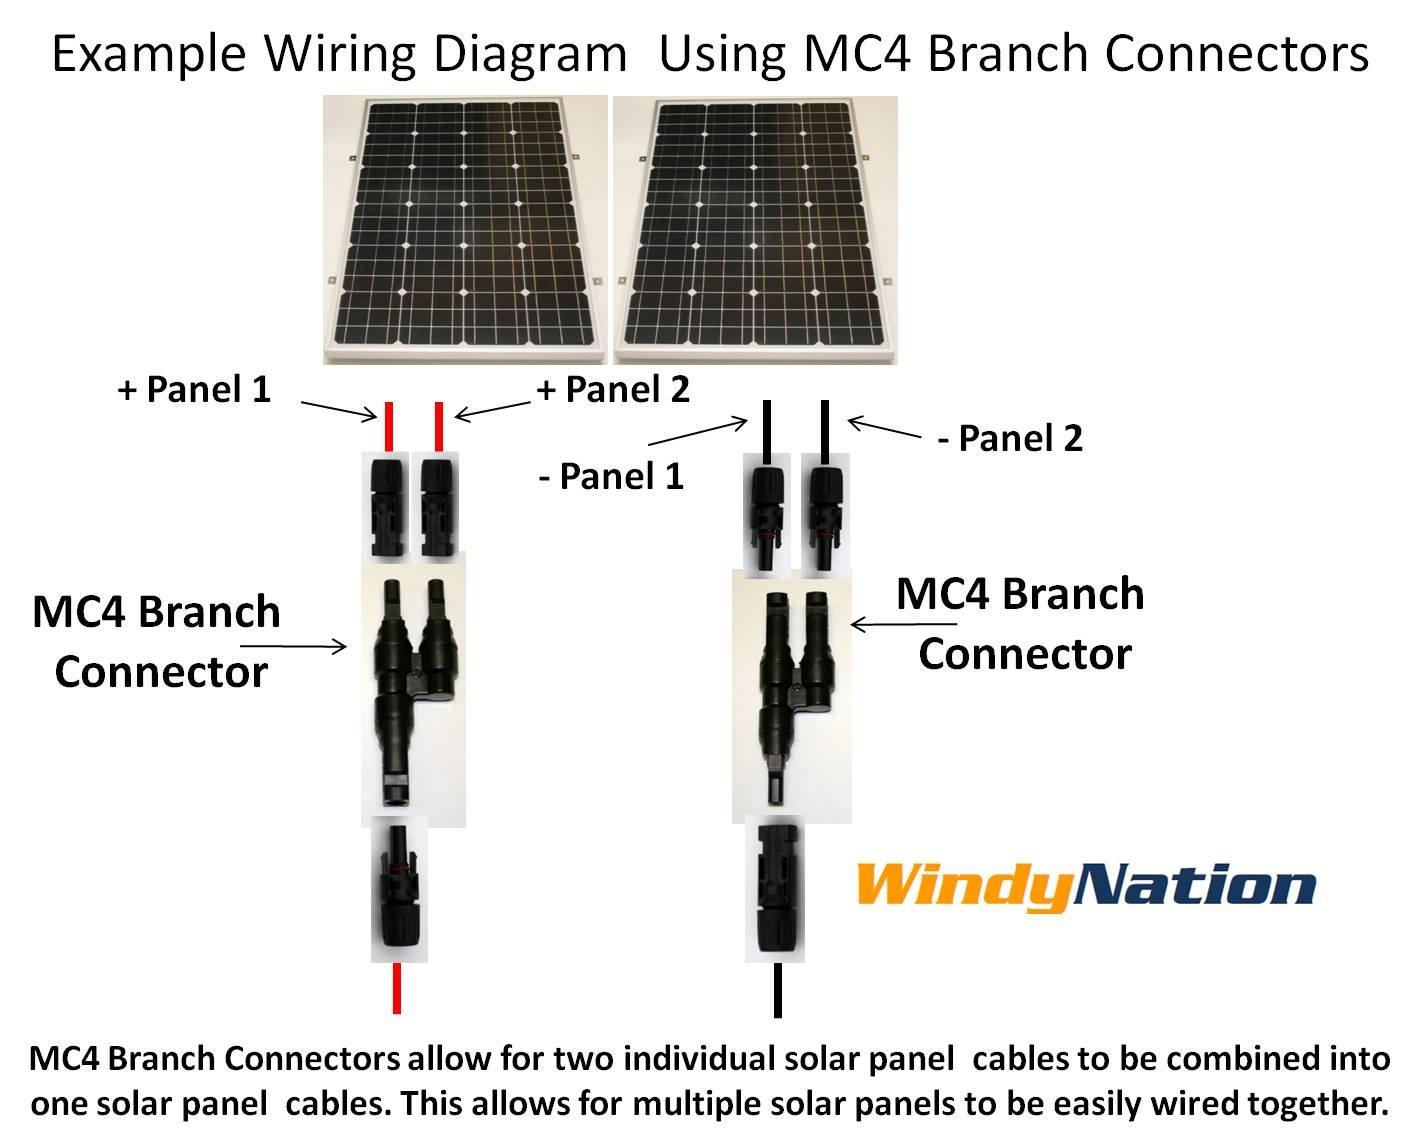 amazon com two pairs solar panel mc4 t branch connectors cable rh amazon com Solar Panel Wire Connectors Wiring Solar Panels Together